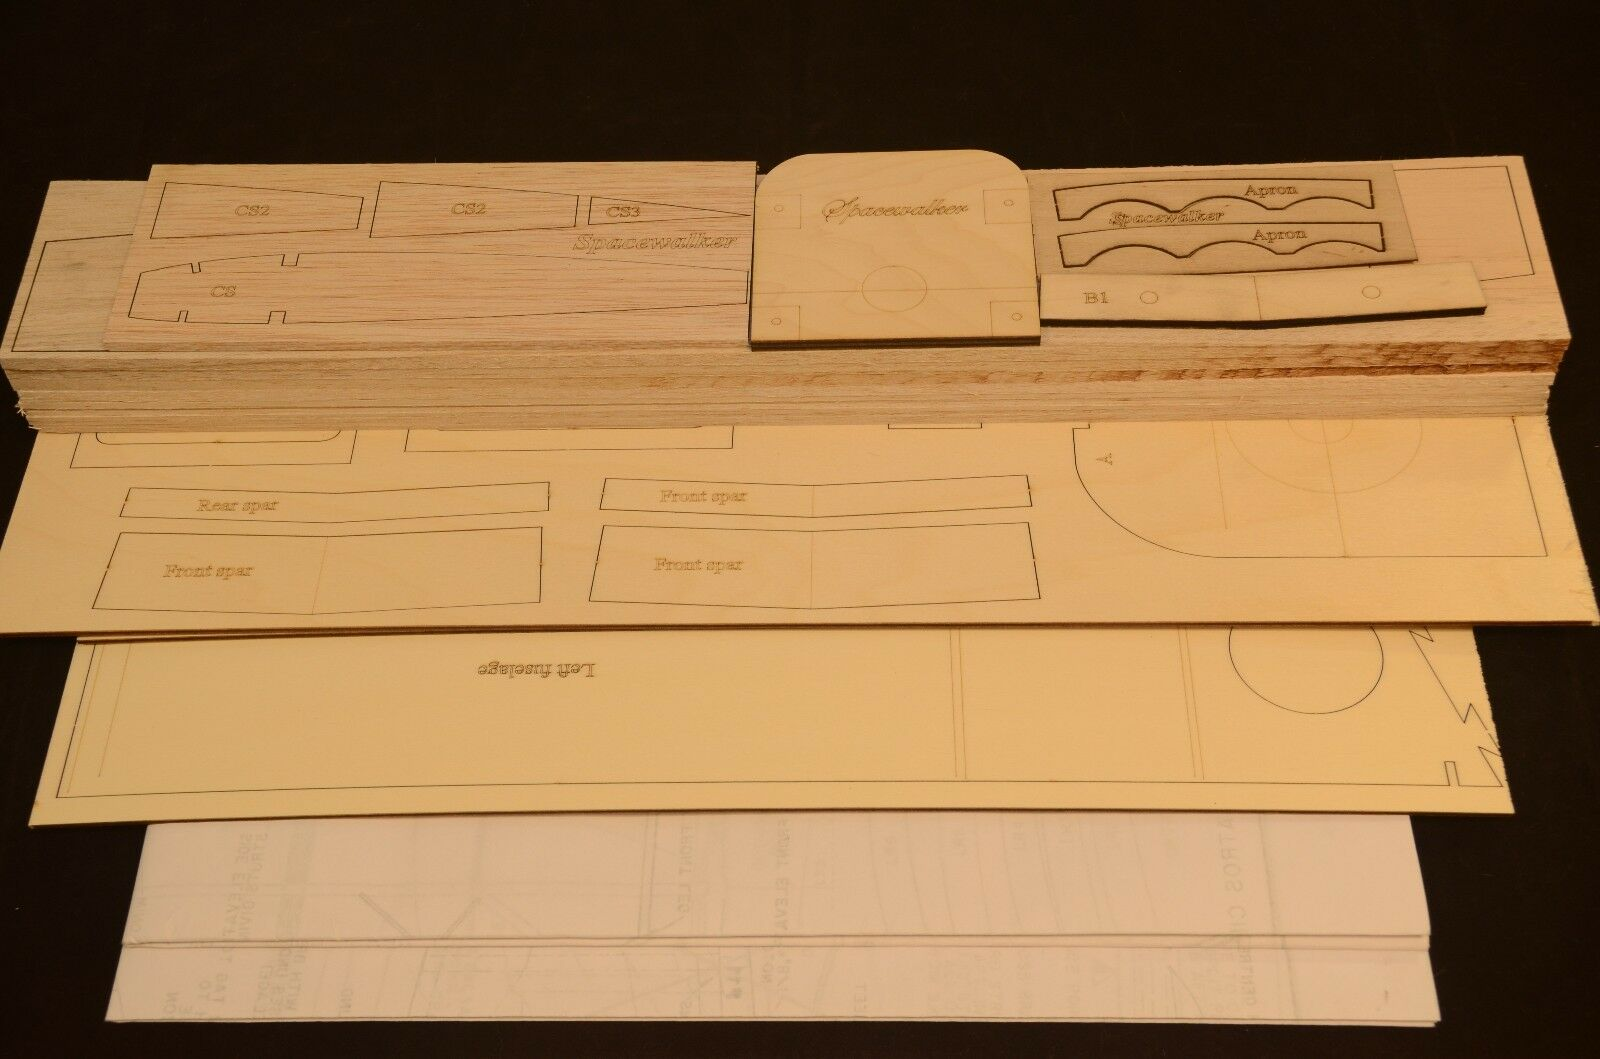 1/4.3 Escala Kit De Corte Láser Spacewalker Corto & planes 78 en ala palmo